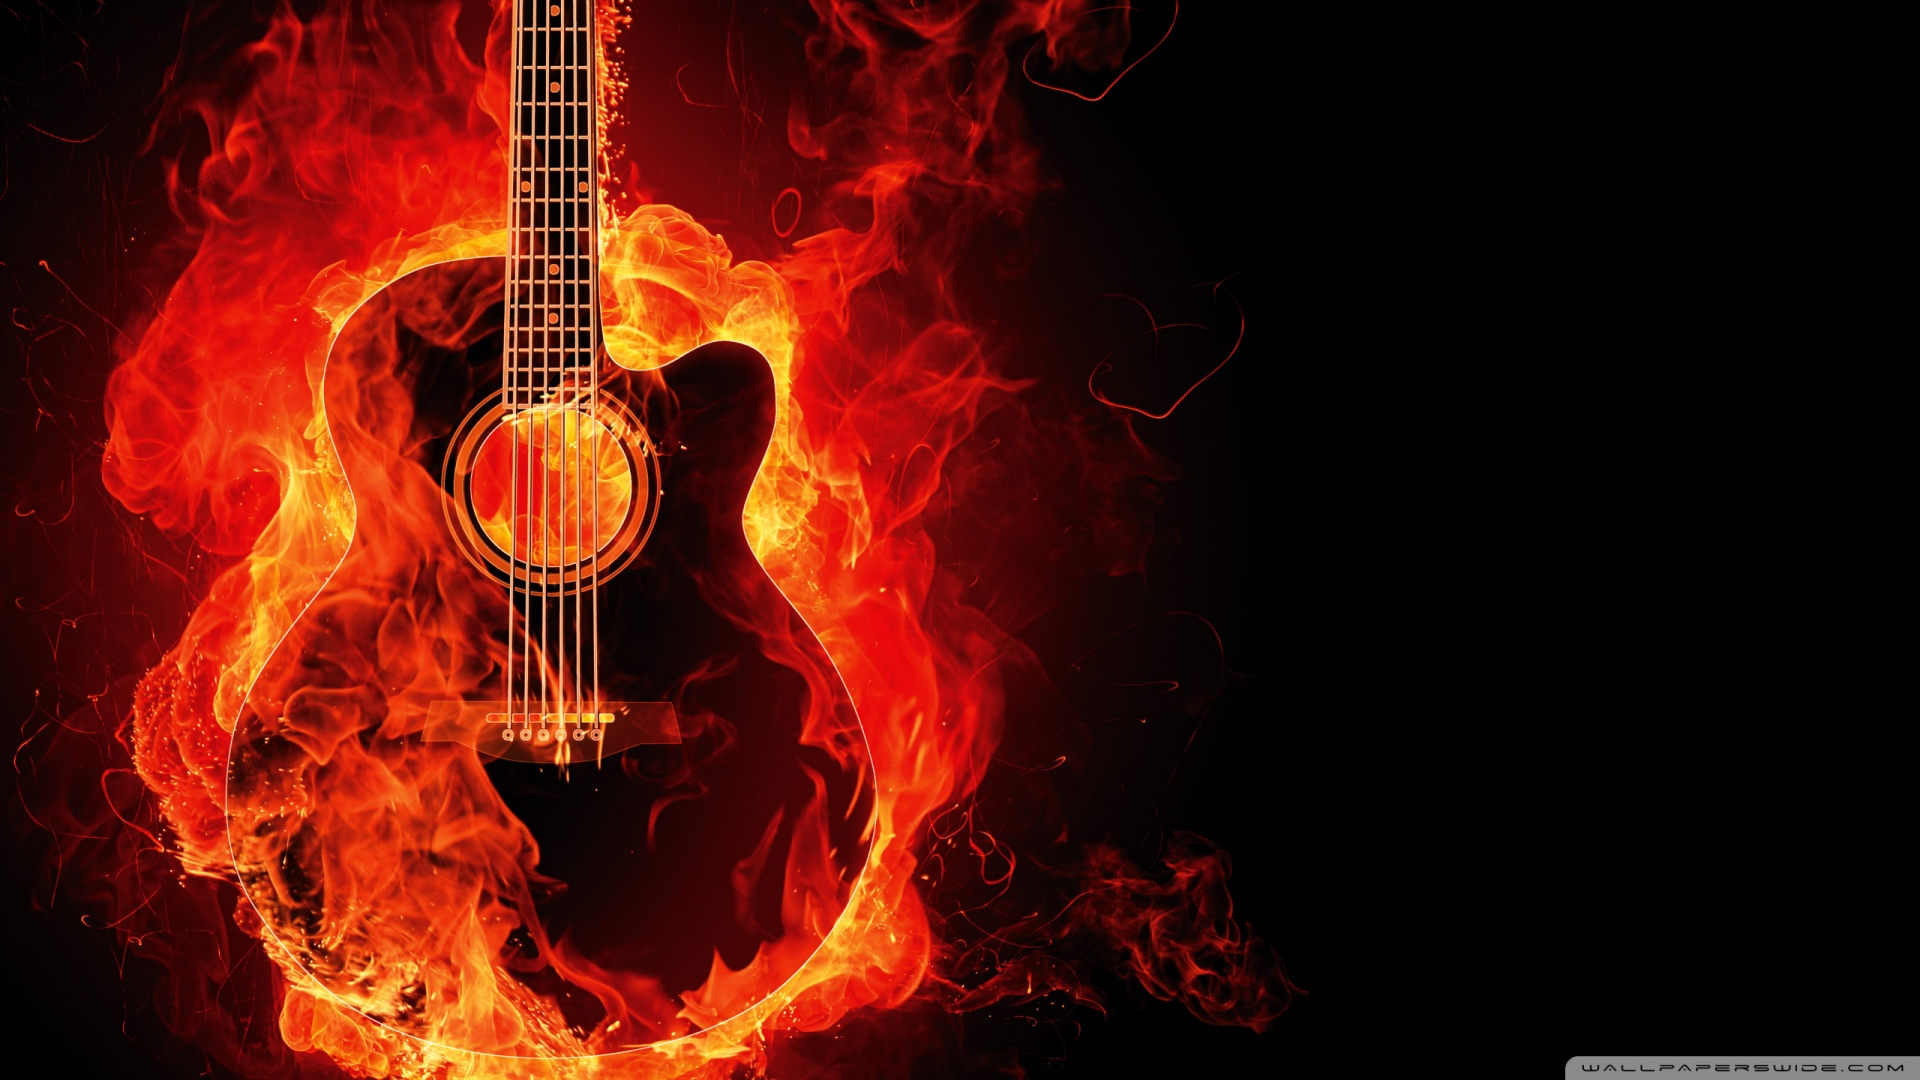 guitar wallpaper widescreen - photo #29